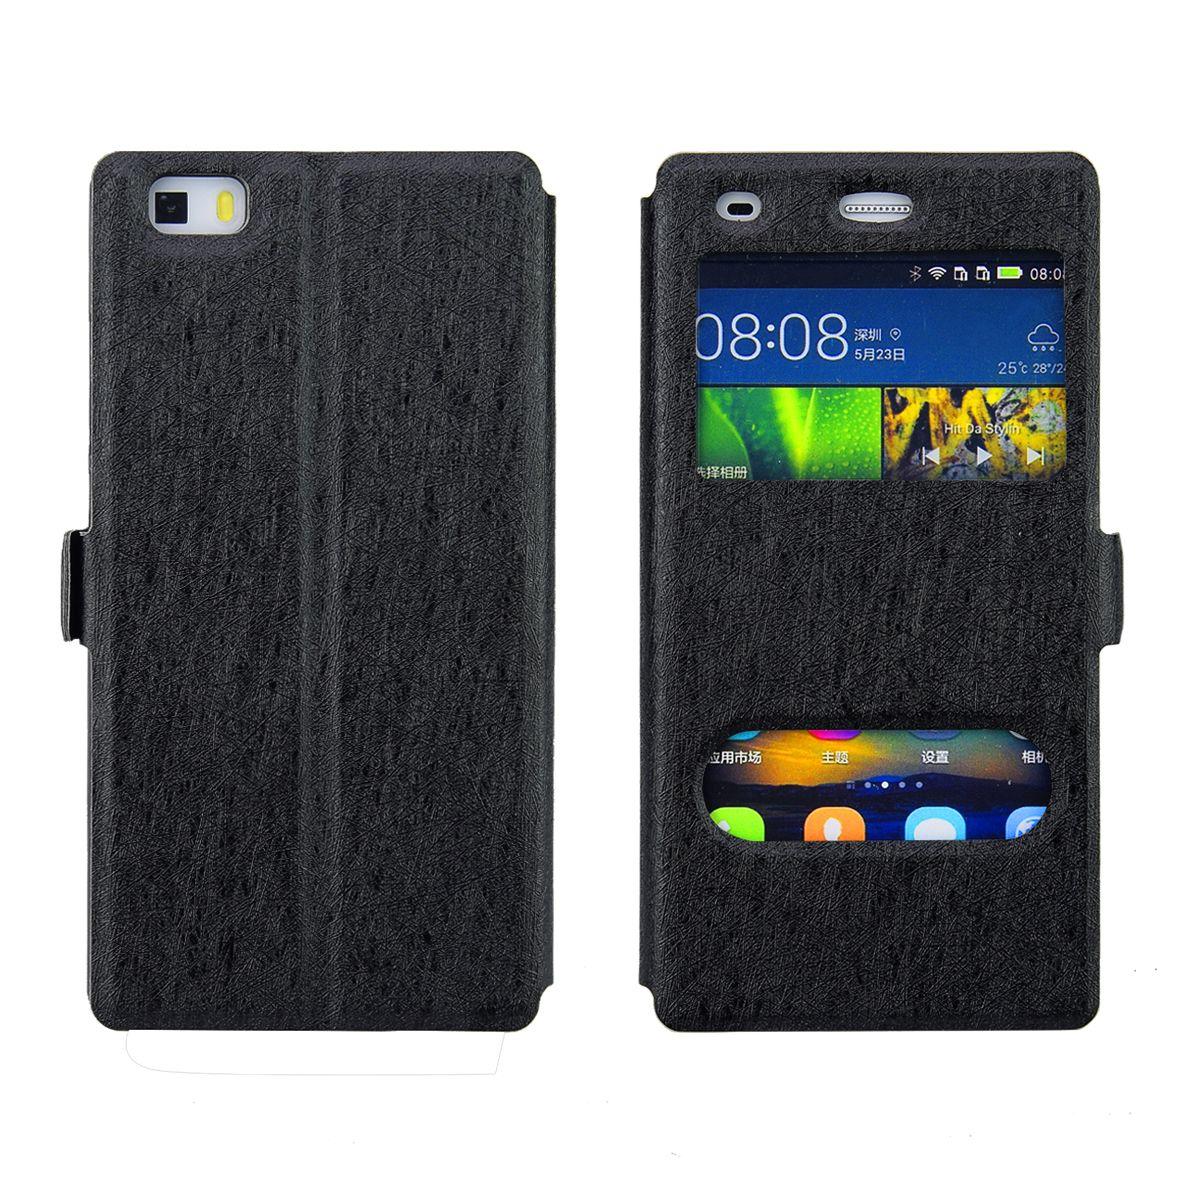 2c323b5e254 Carcasas Para El Caso Del IPhone X Doble Ventana De Doble Vista Con Soporte  Soporte Funda De Cuero Con Tapa Para Iphone 8 8 Plus 7 7 Plus 6 6 Plus 5 ...